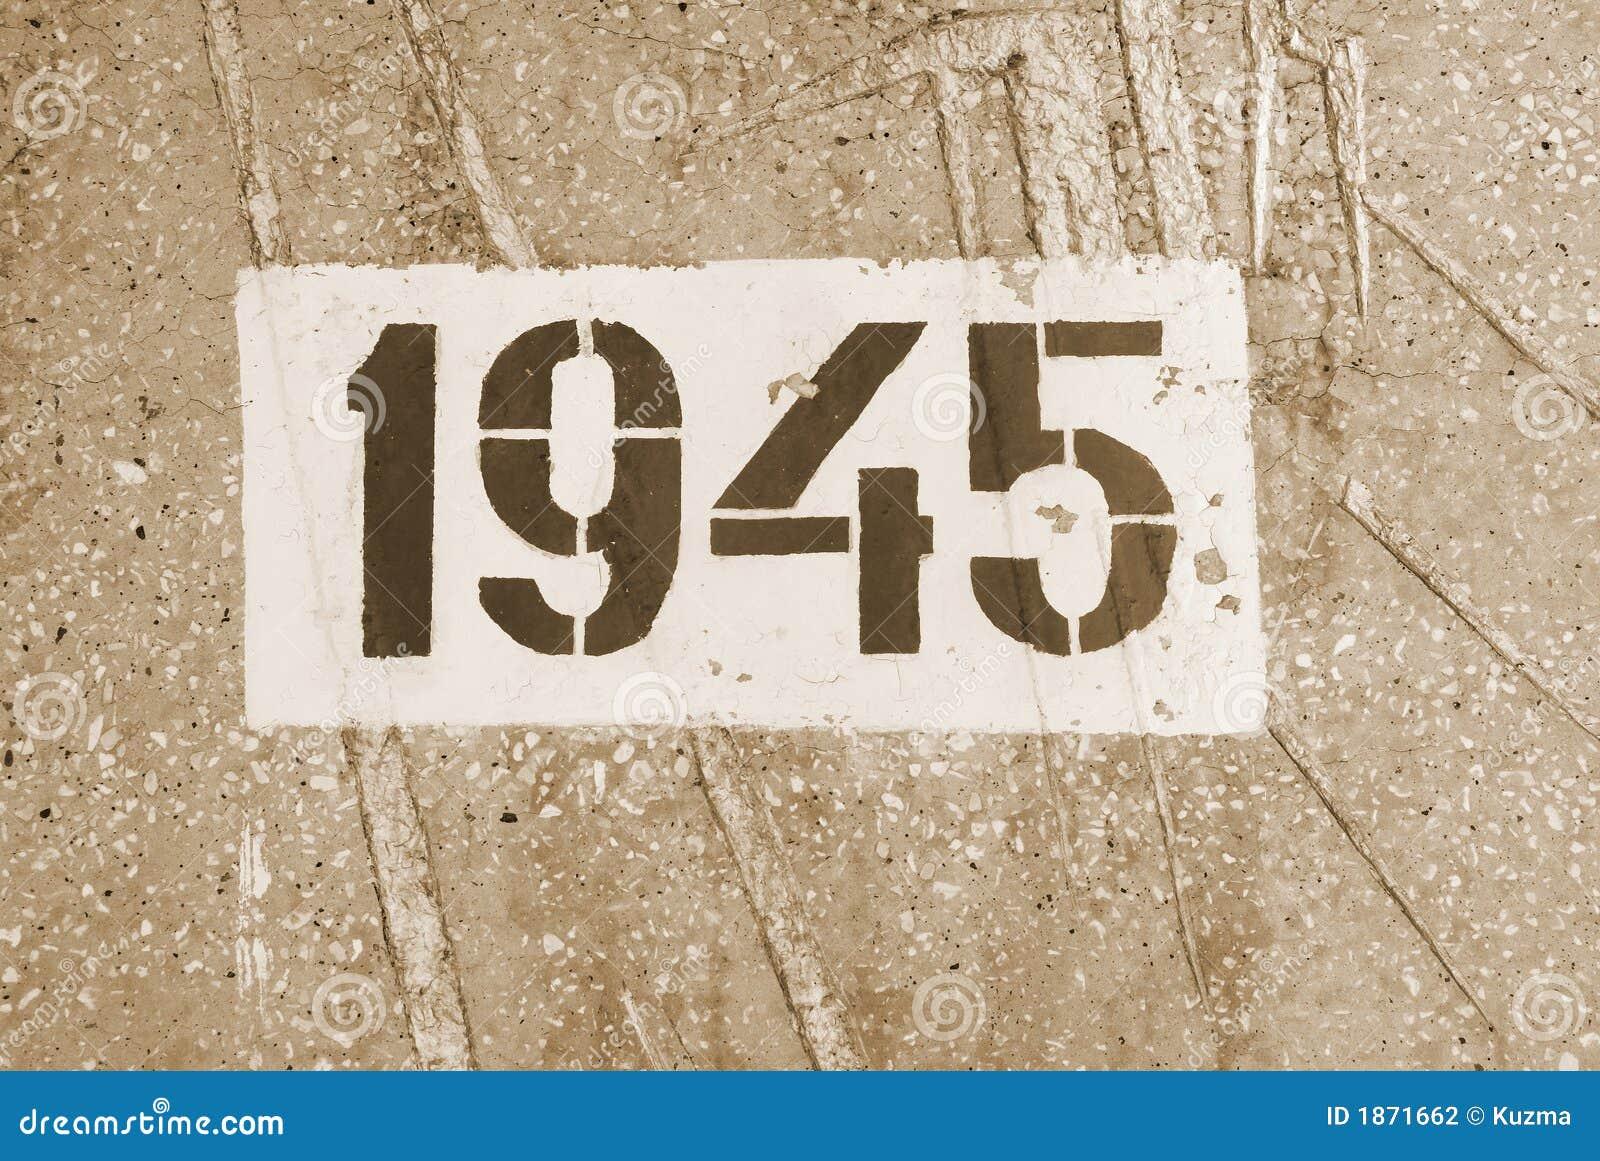 World War One Stock Vector - Image: 42205853